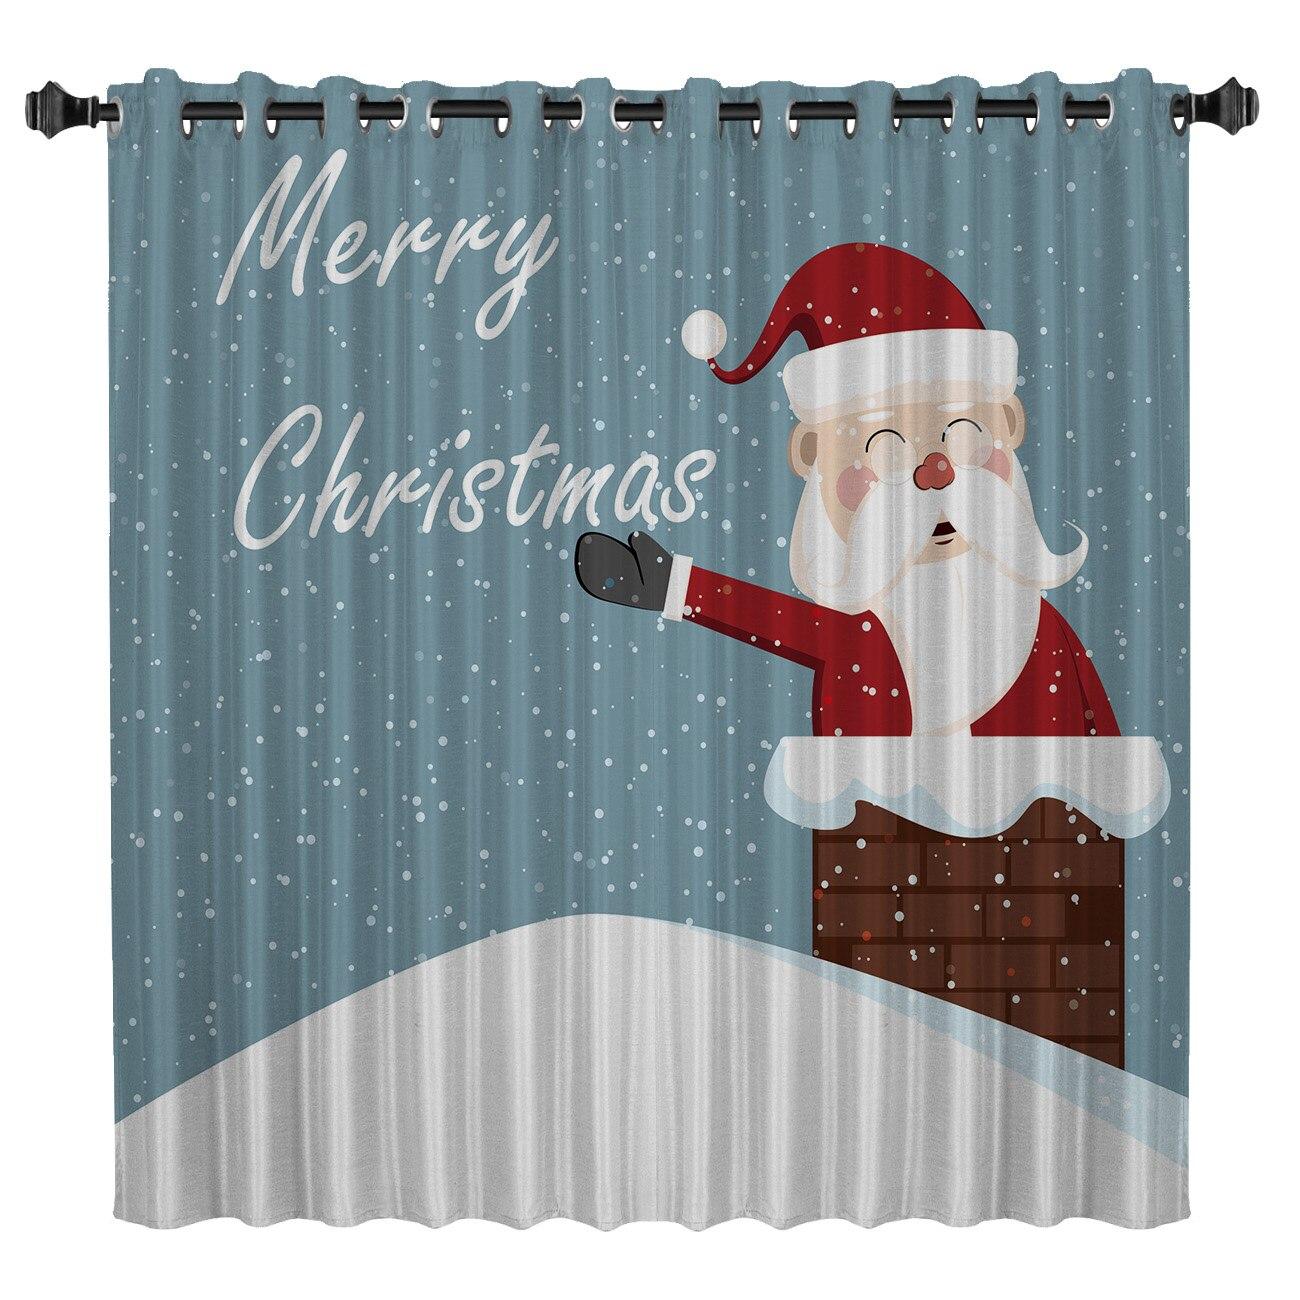 Merry Christmas Santa Window Treatments Curtains Valance Window Blinds Bathroom Bedroom Fabric Kids Curtain Panels With Grommets